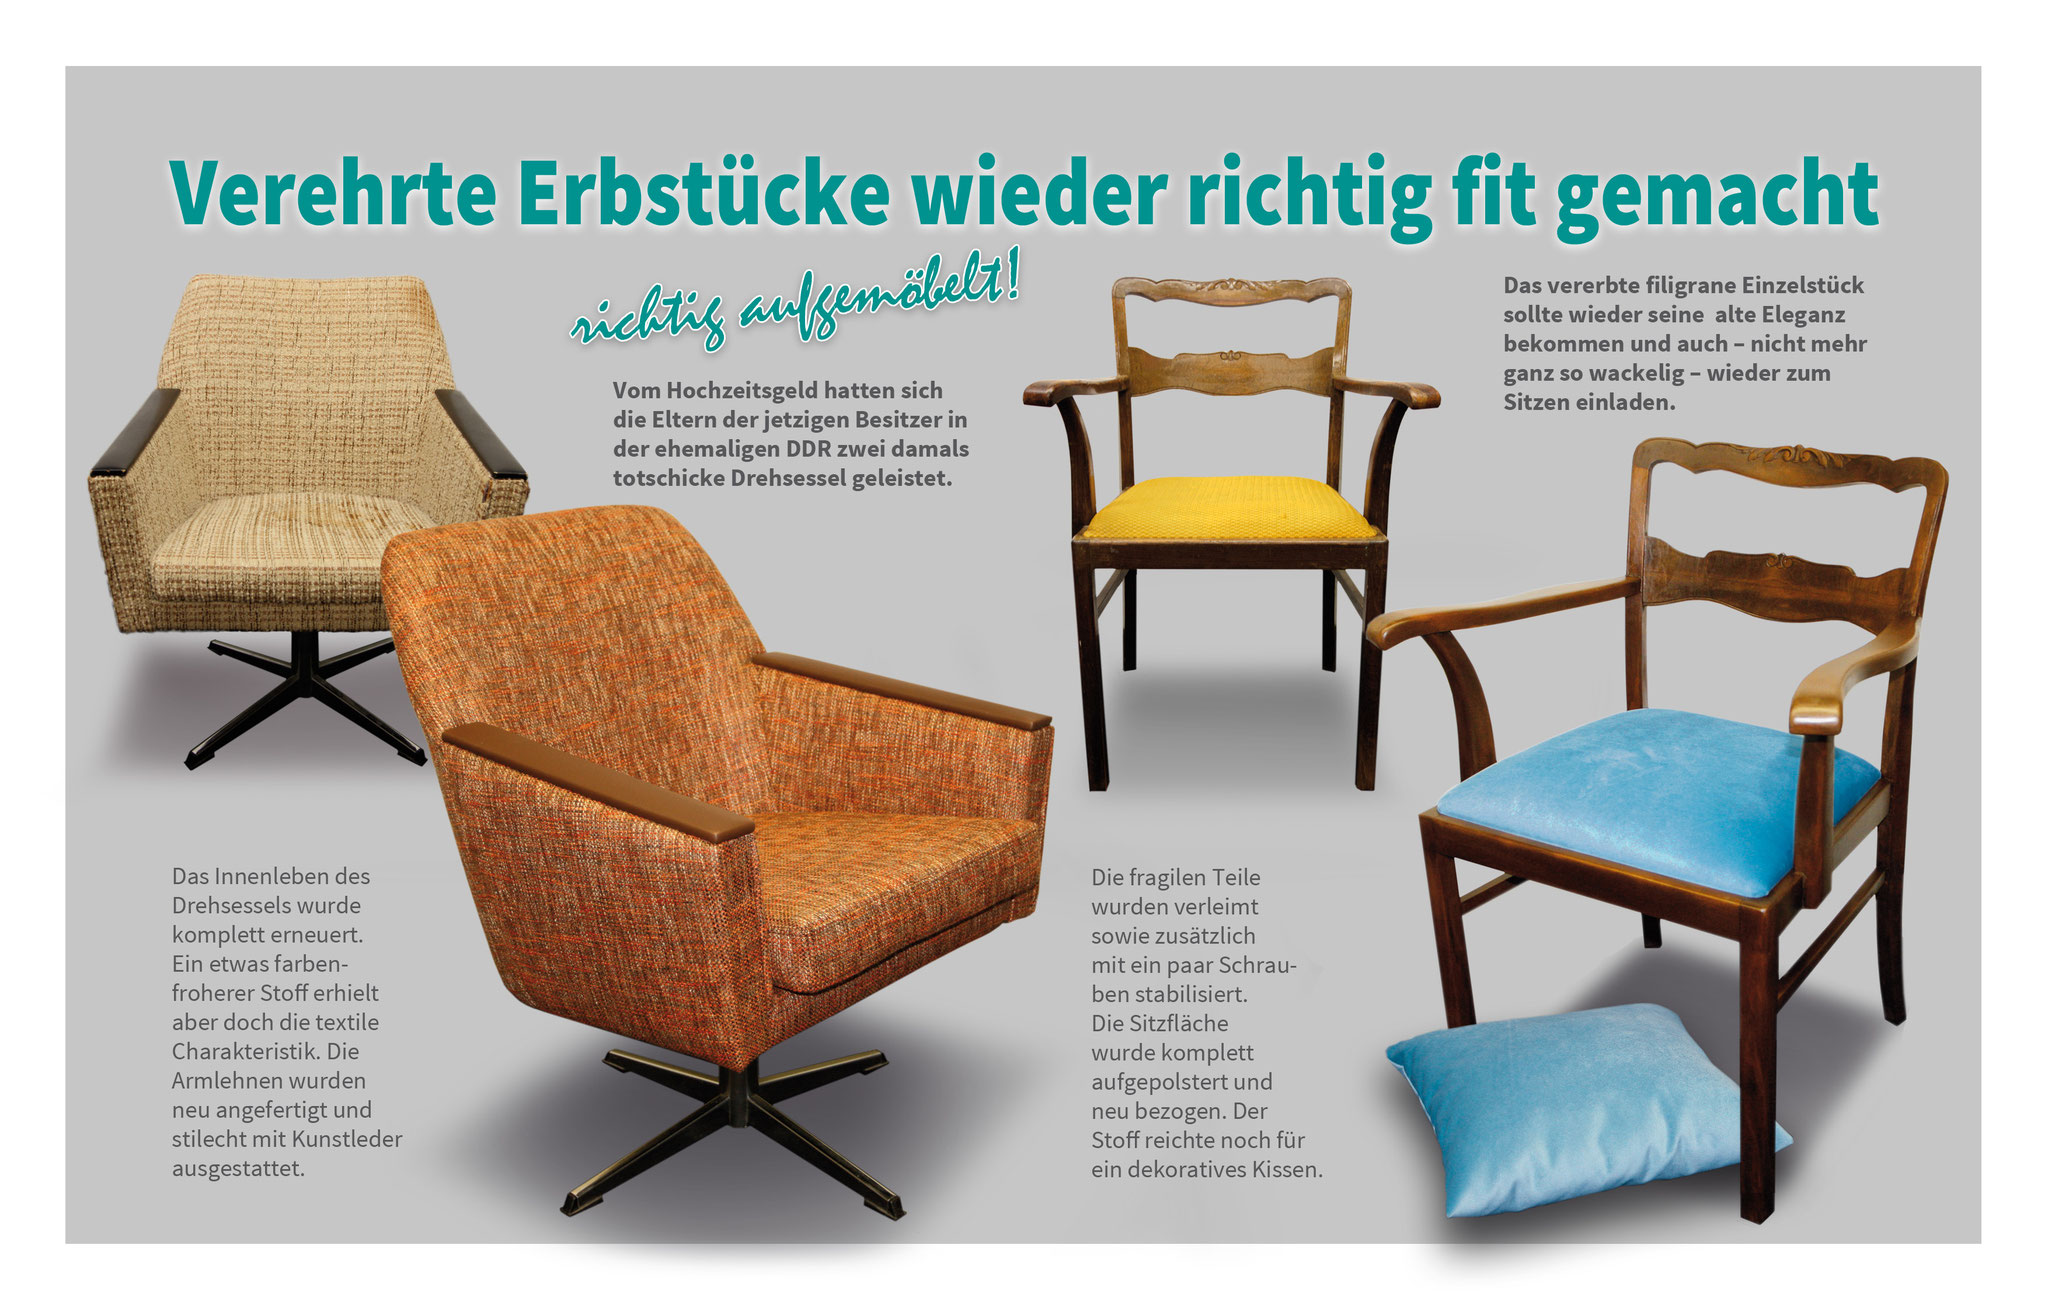 leistungen atelier karnat polsterei raumausstattung. Black Bedroom Furniture Sets. Home Design Ideas